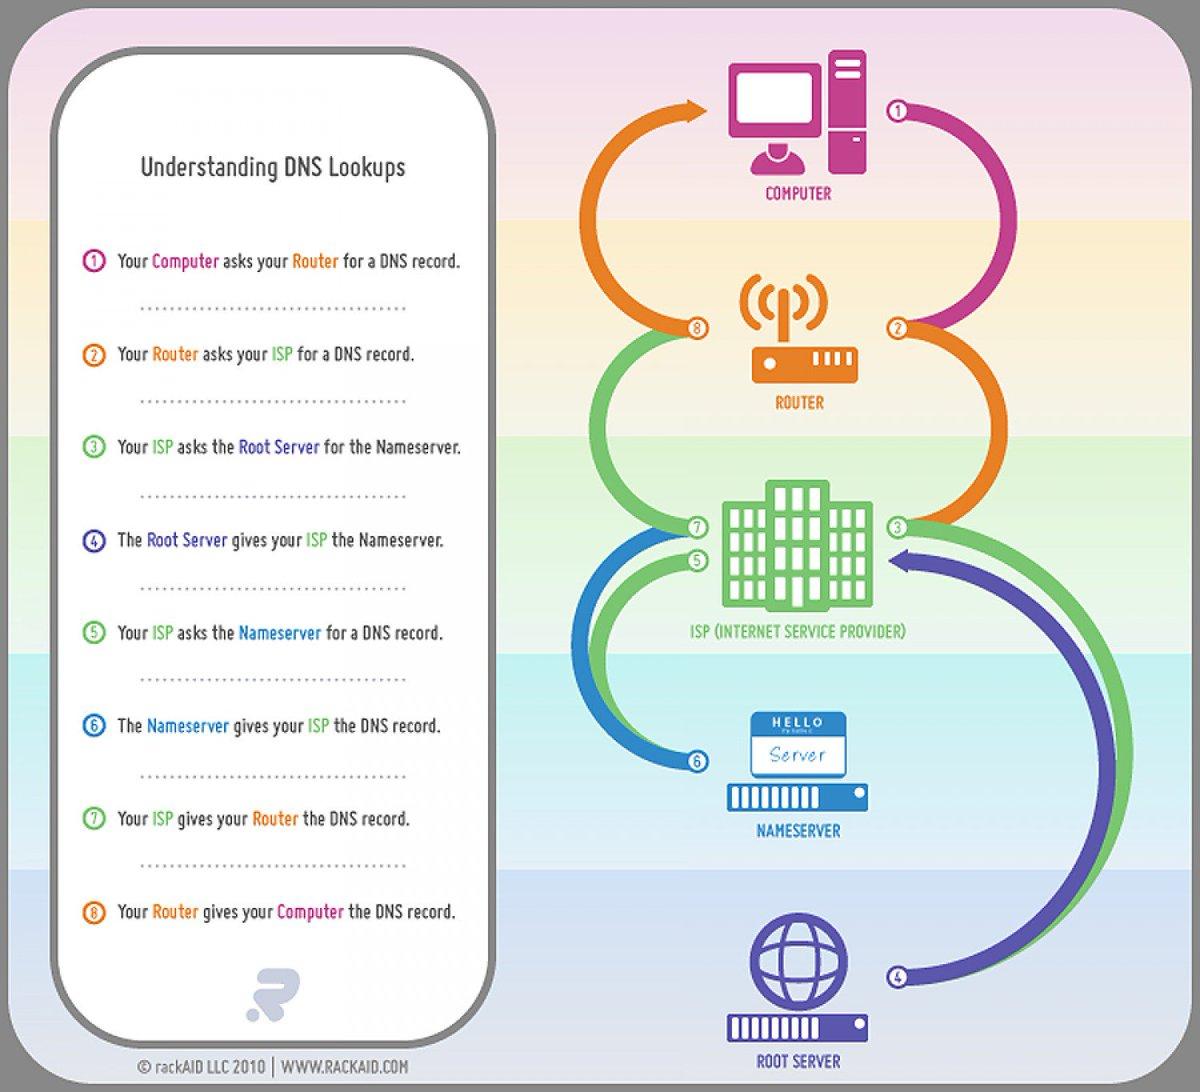 Understanding #DNS Records #server #router #root #nameserver #isp #internet #tech #sysadmin #infosec<br>http://pic.twitter.com/2DYSyemTGh